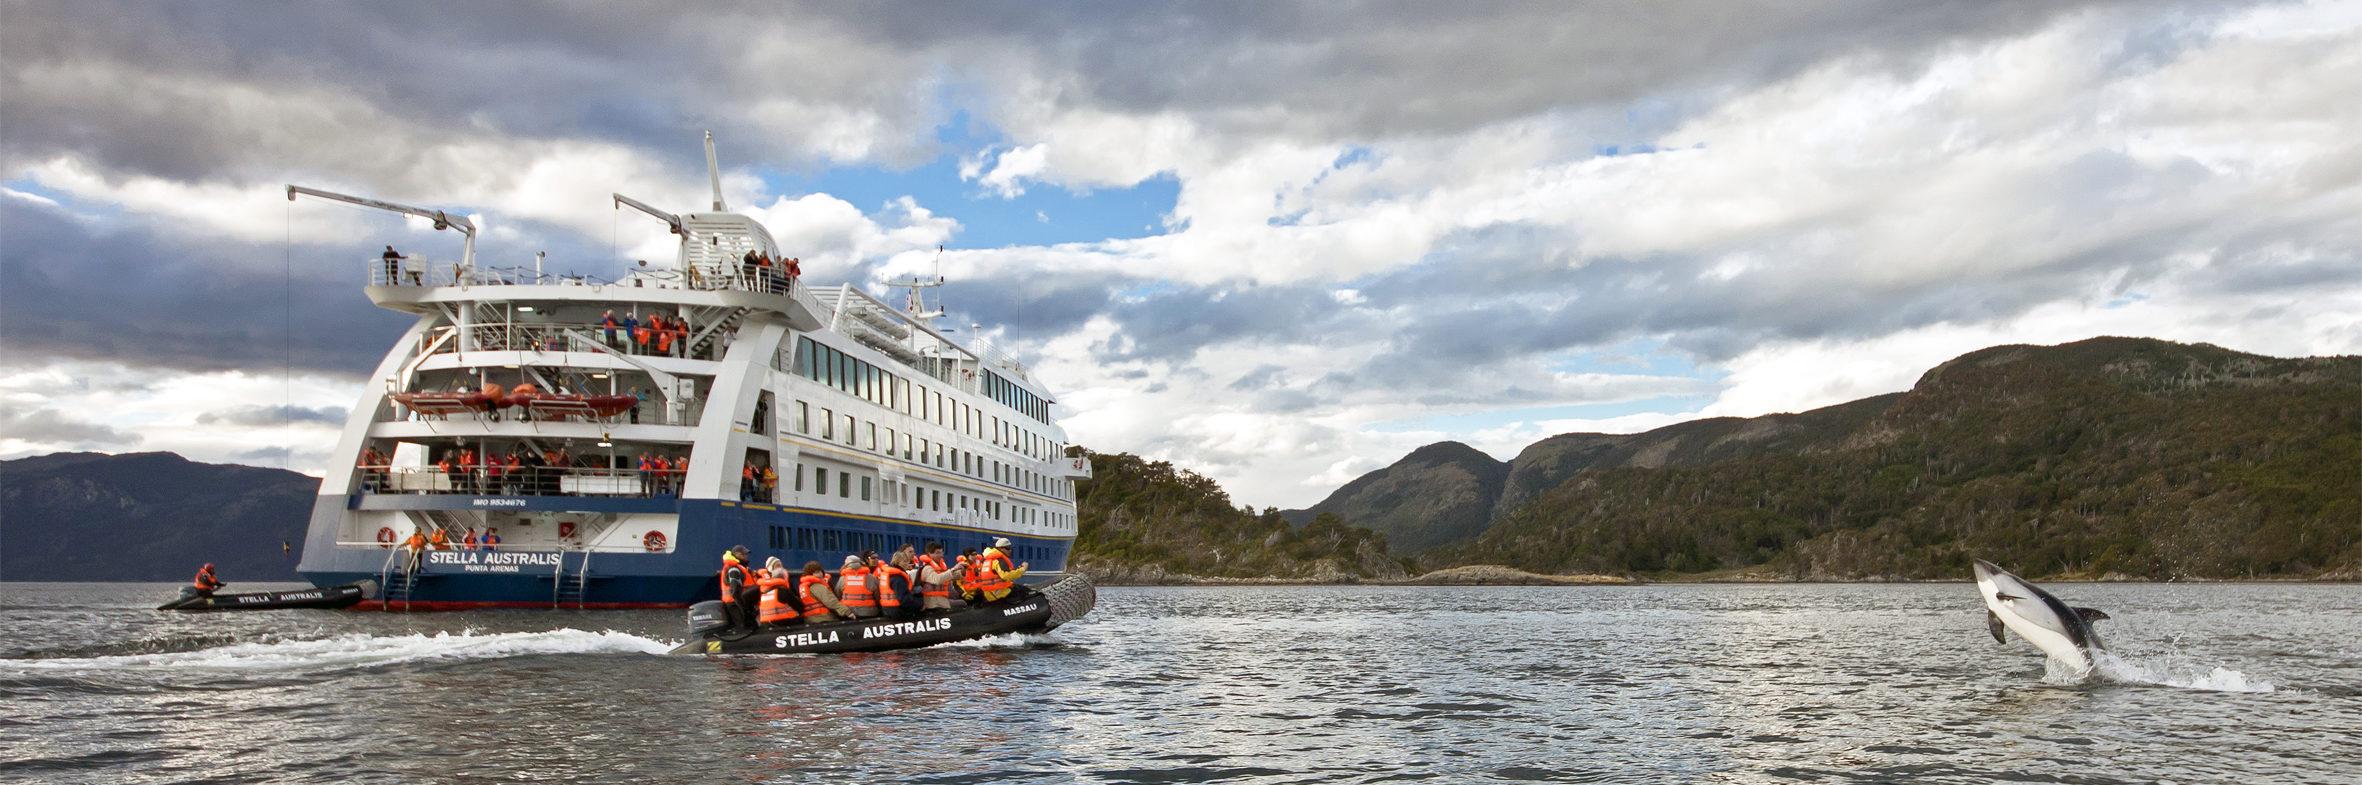 Patagonia with Cruceros Australis